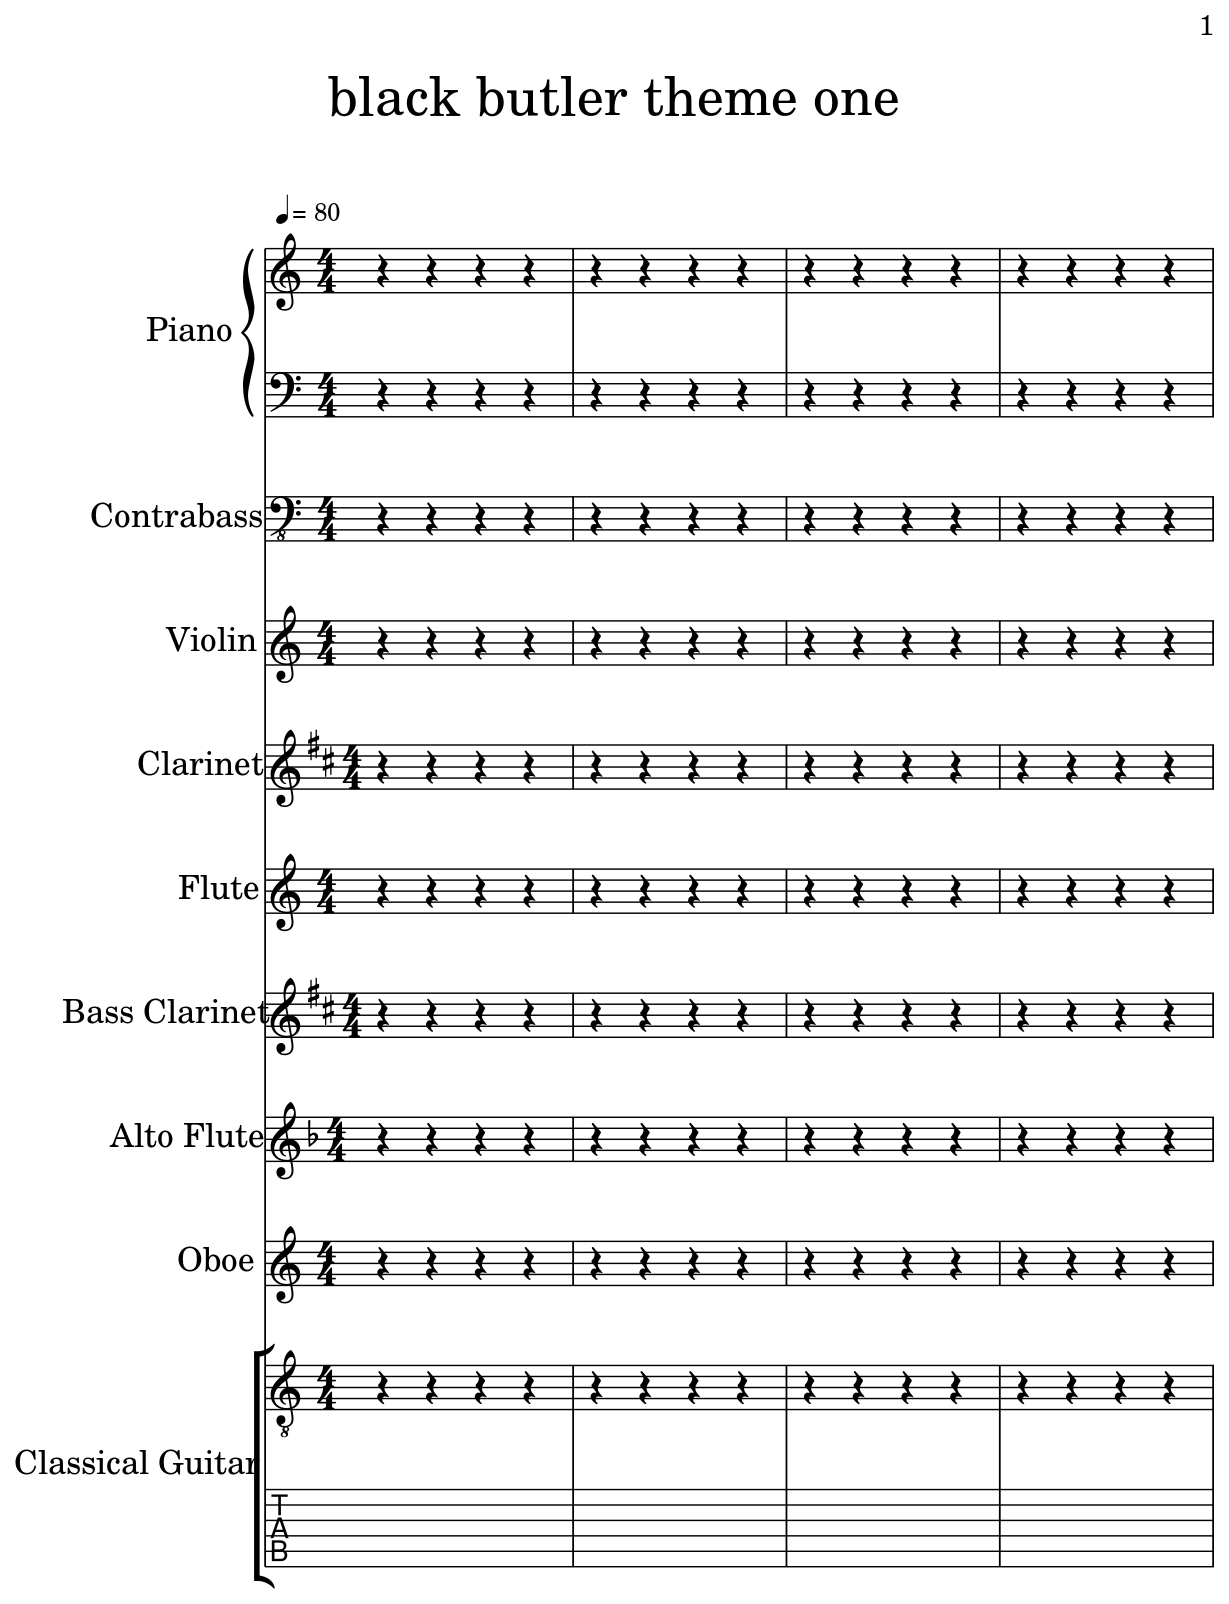 Sheet Music For Piano, Contrabass